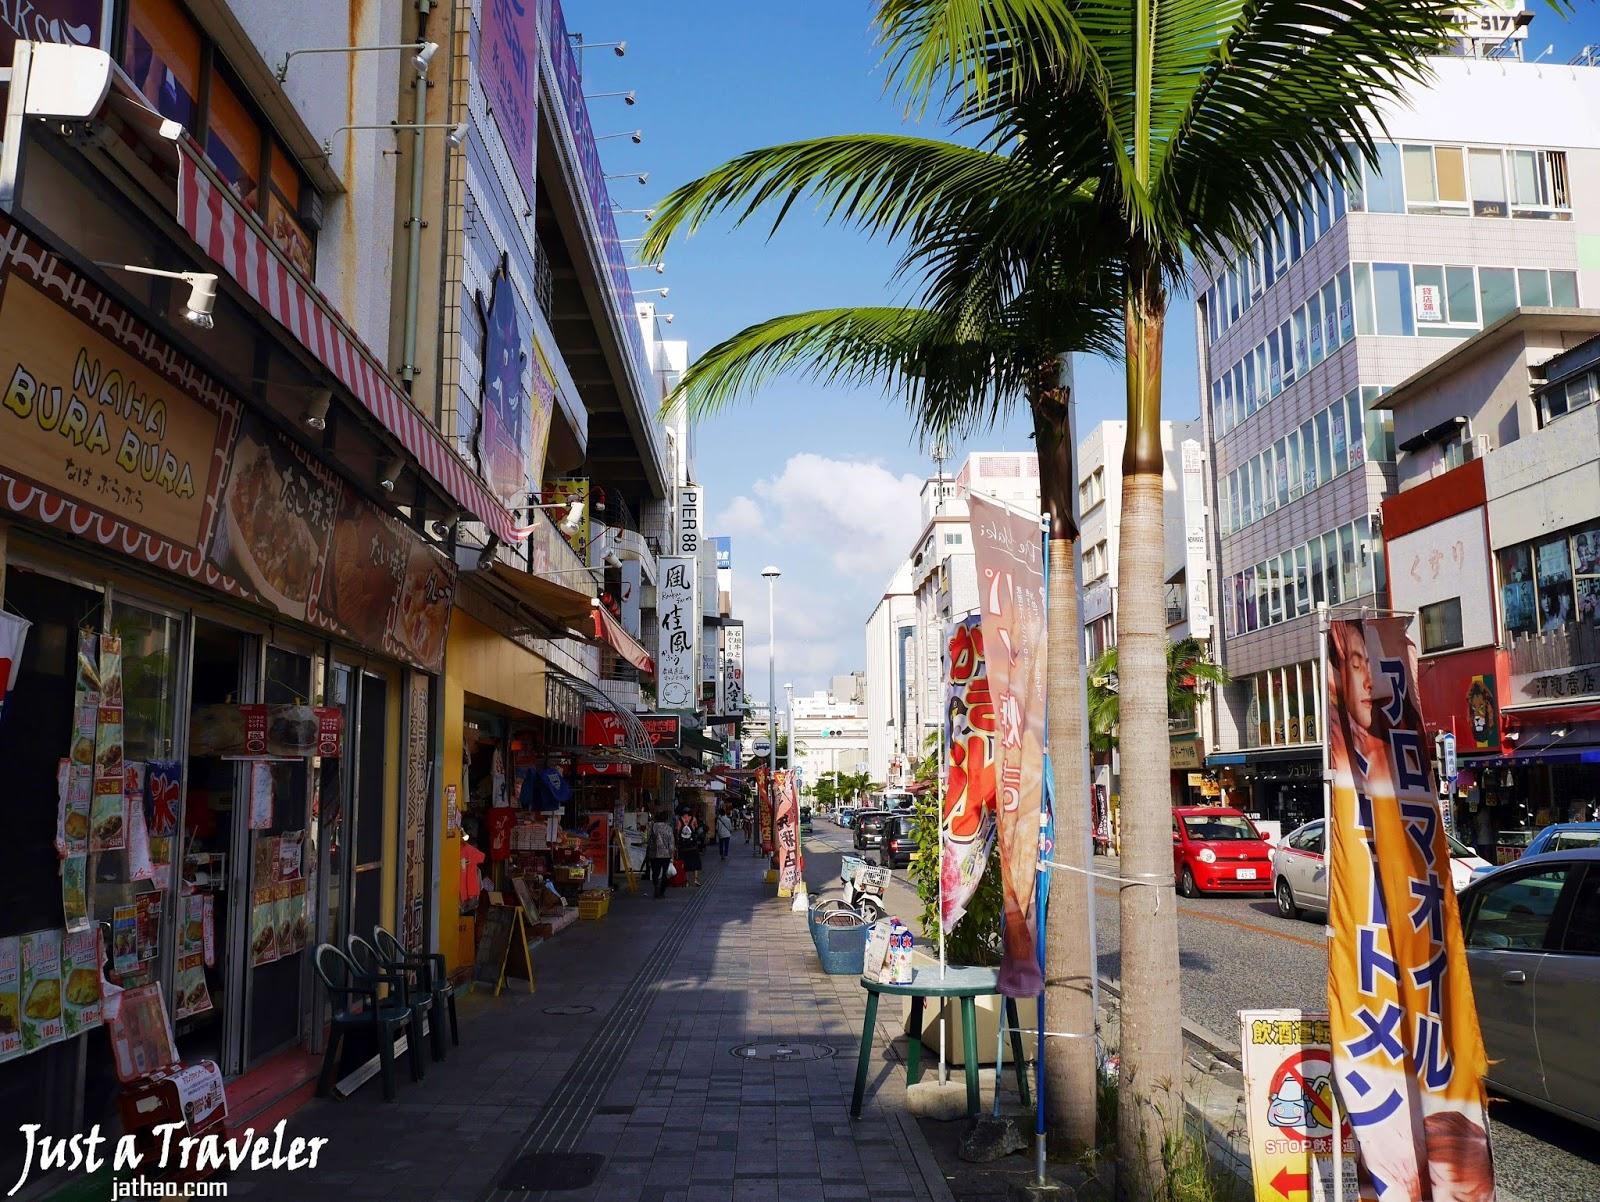 沖繩-景點-推薦-國際通-那霸-逛街-購物-自由行-旅遊-Okinawa-attraction-Kokusaidori-shopping-Naha-Toruist-destination